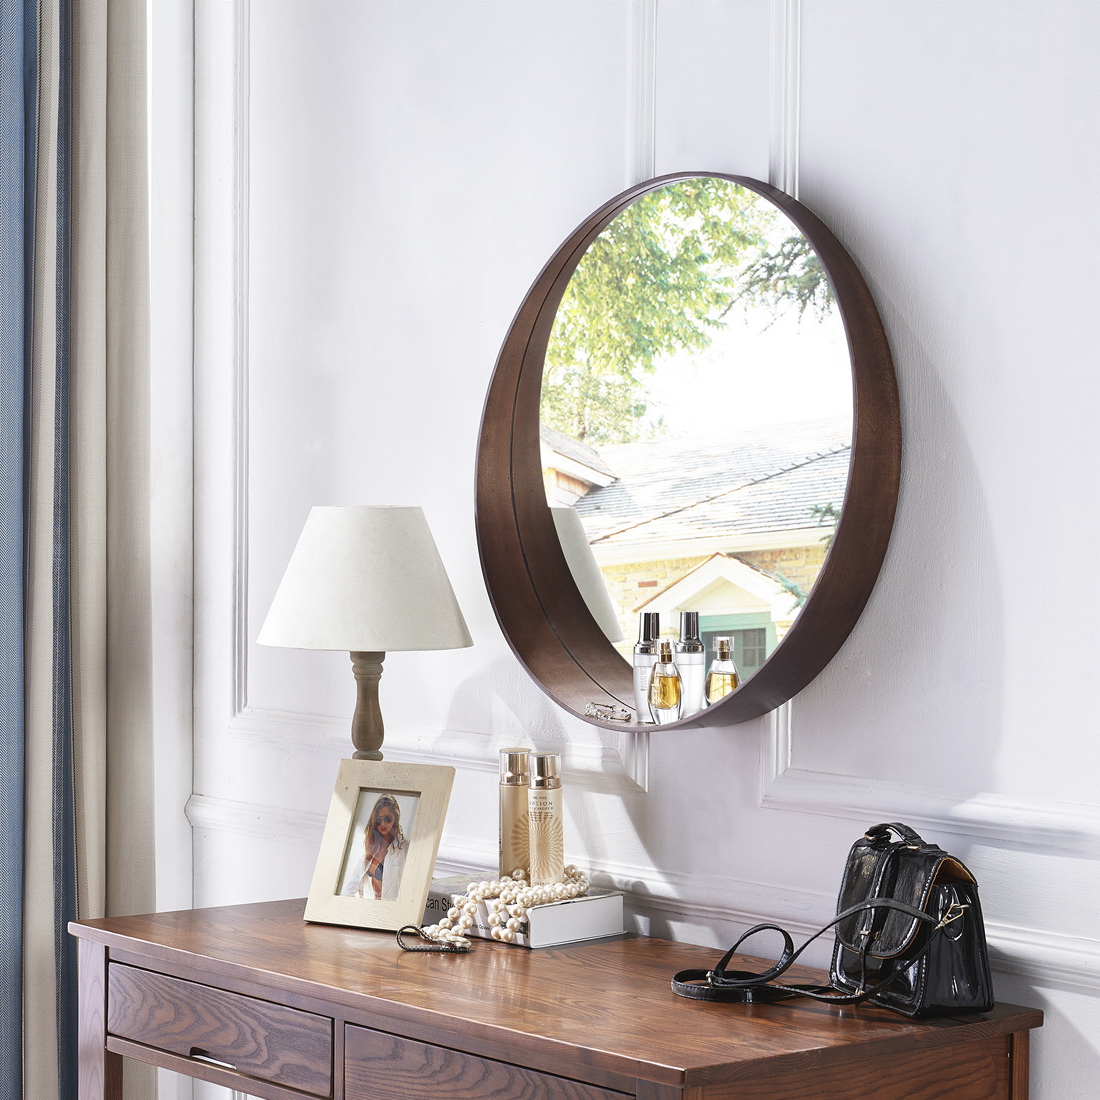 USD 158.25] European style solid wood bathroom mirror bathroom ...